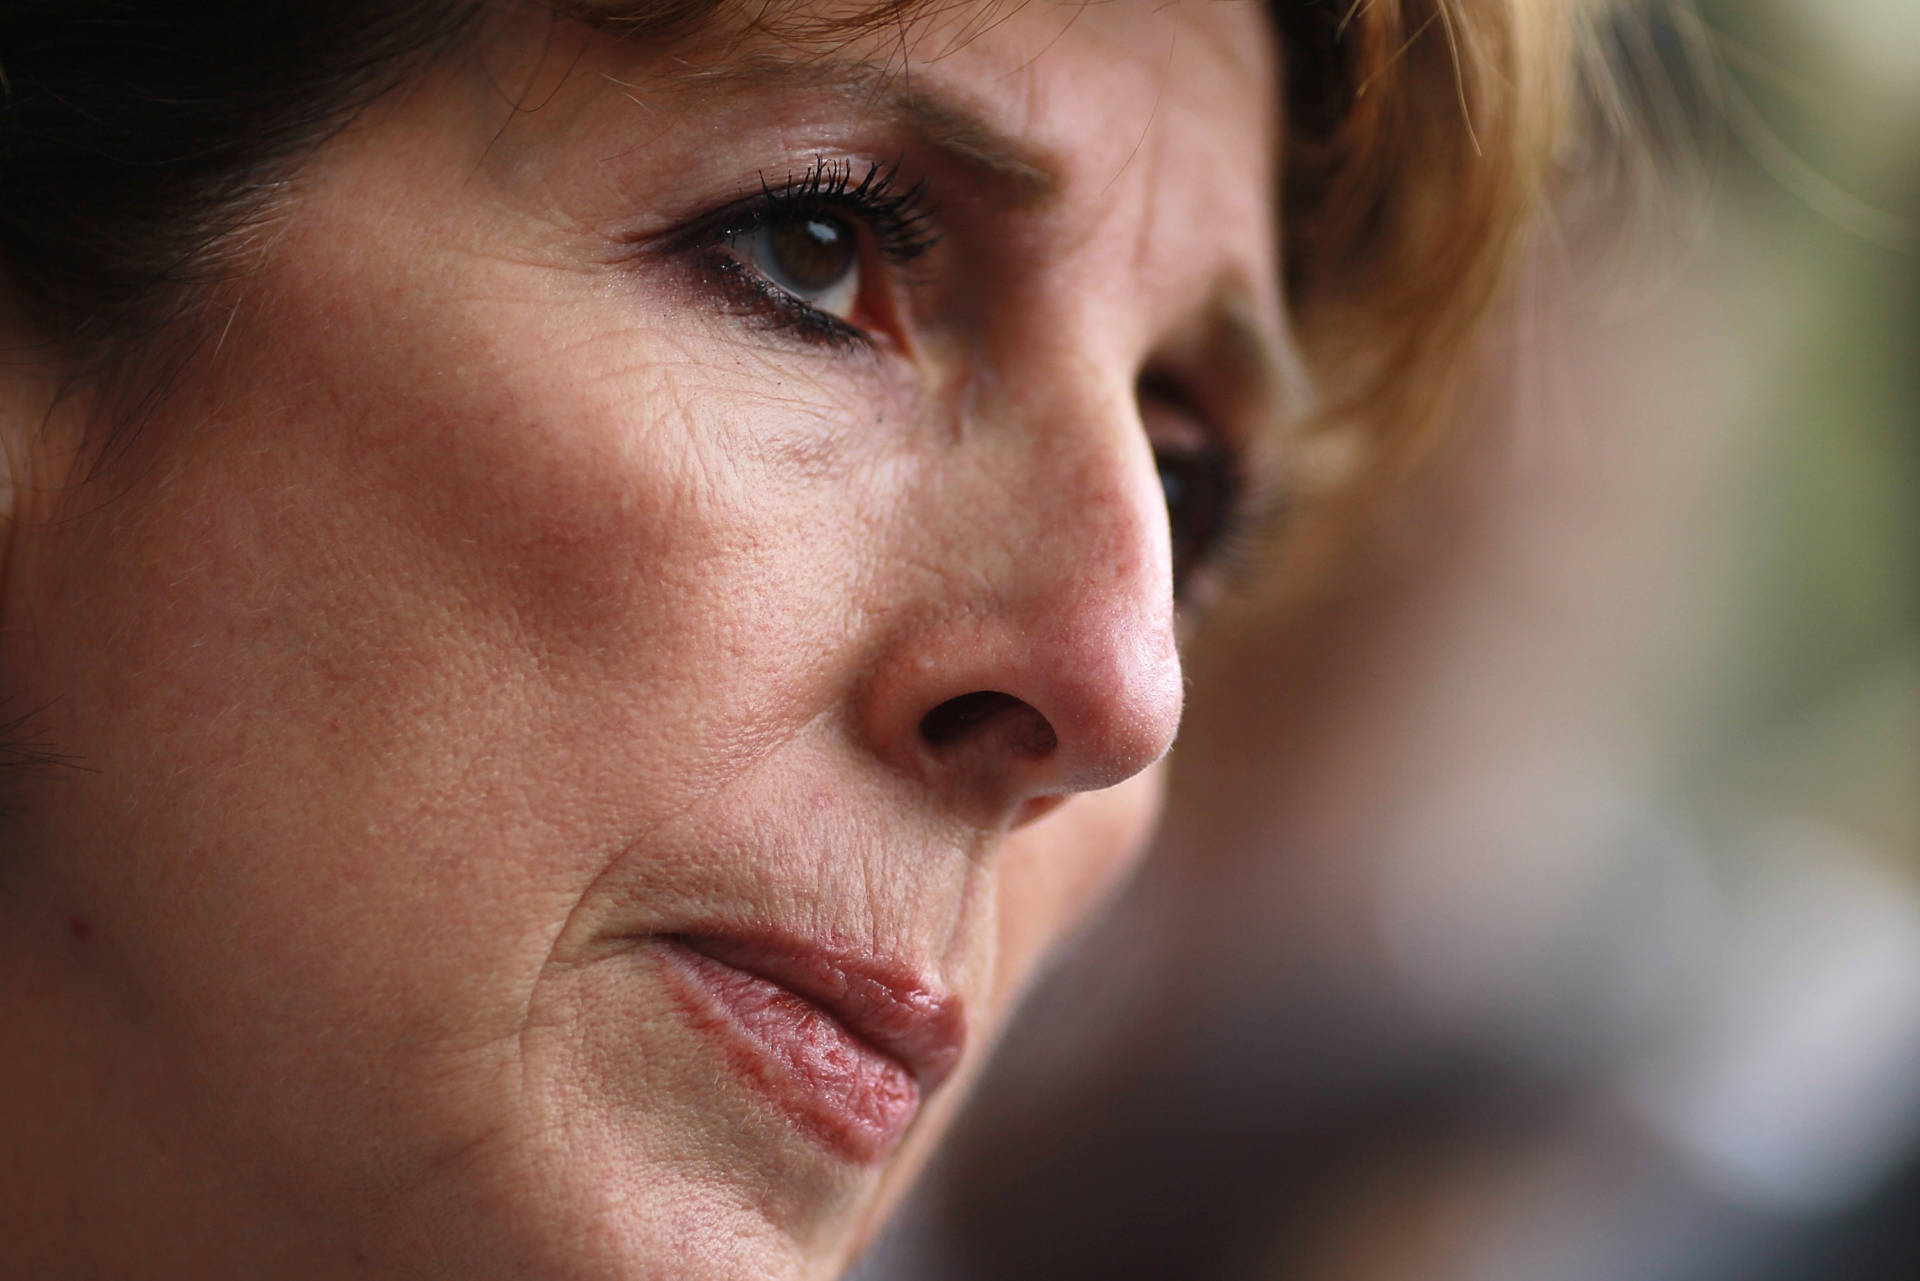 UC Davis Chancellor Linda Katehi Resigns After Stormy 7-Year Tenure